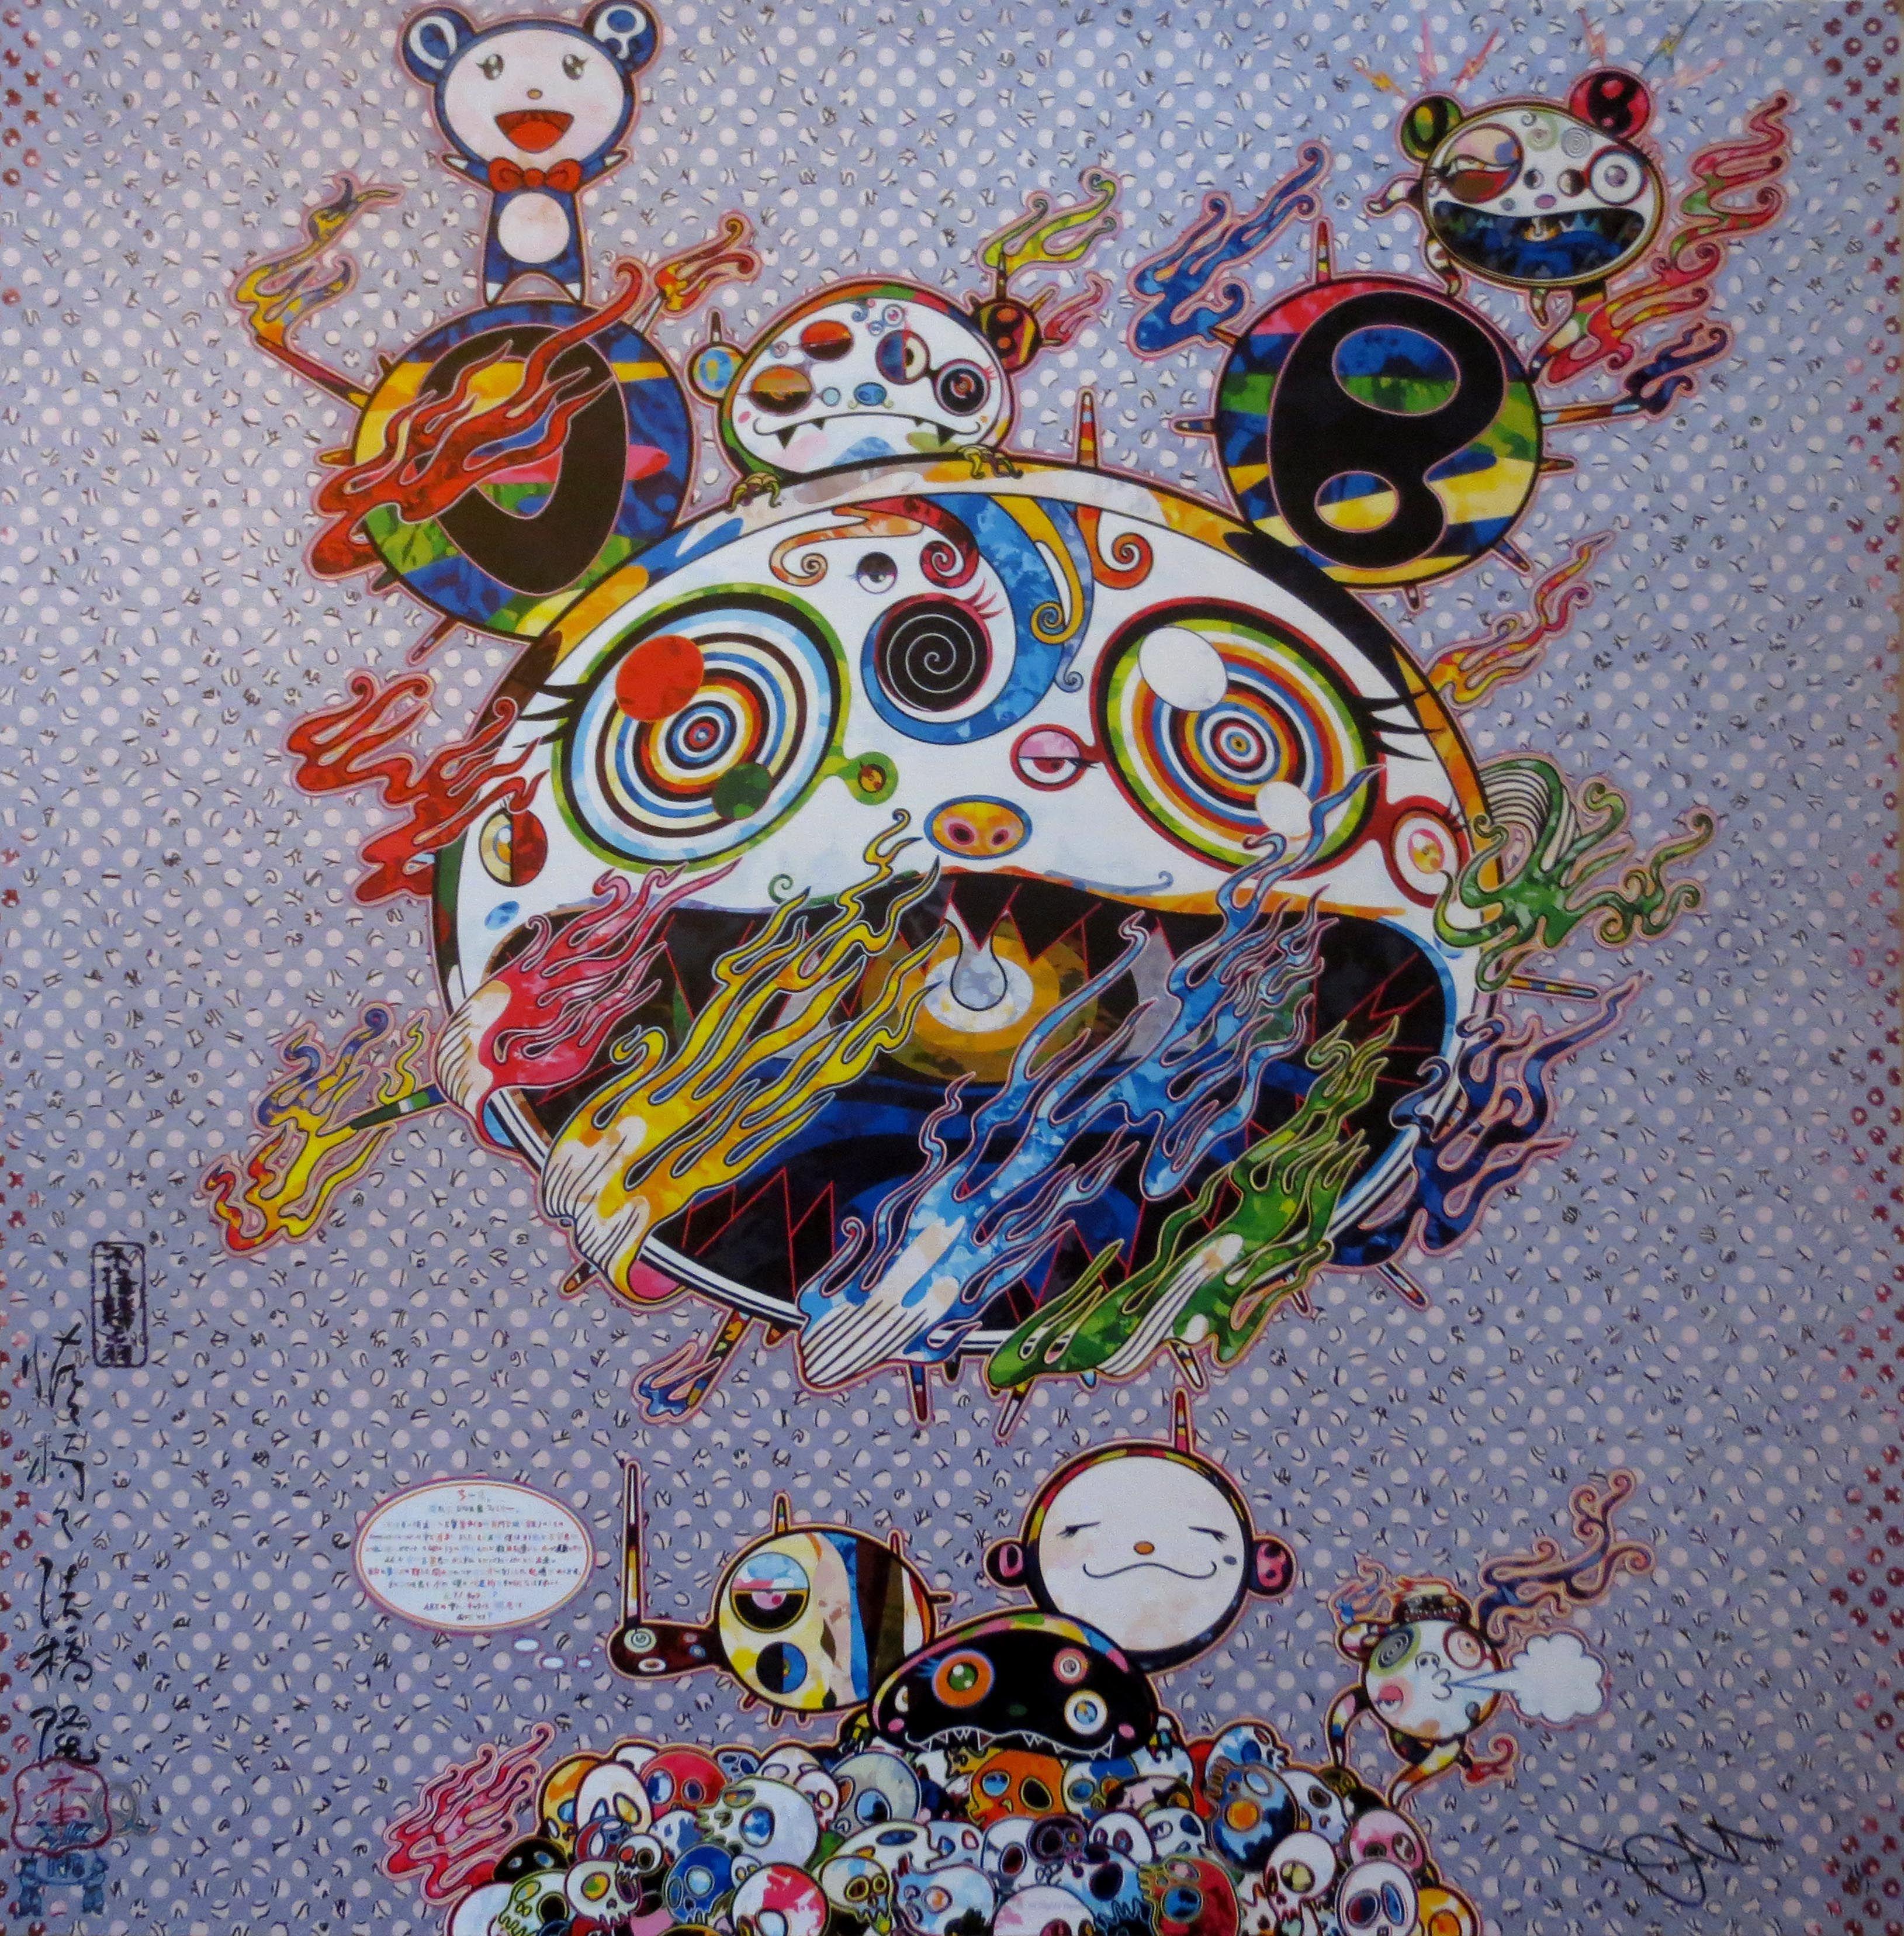 murakami Takashi murakami, Takashi murakami art, Takashi